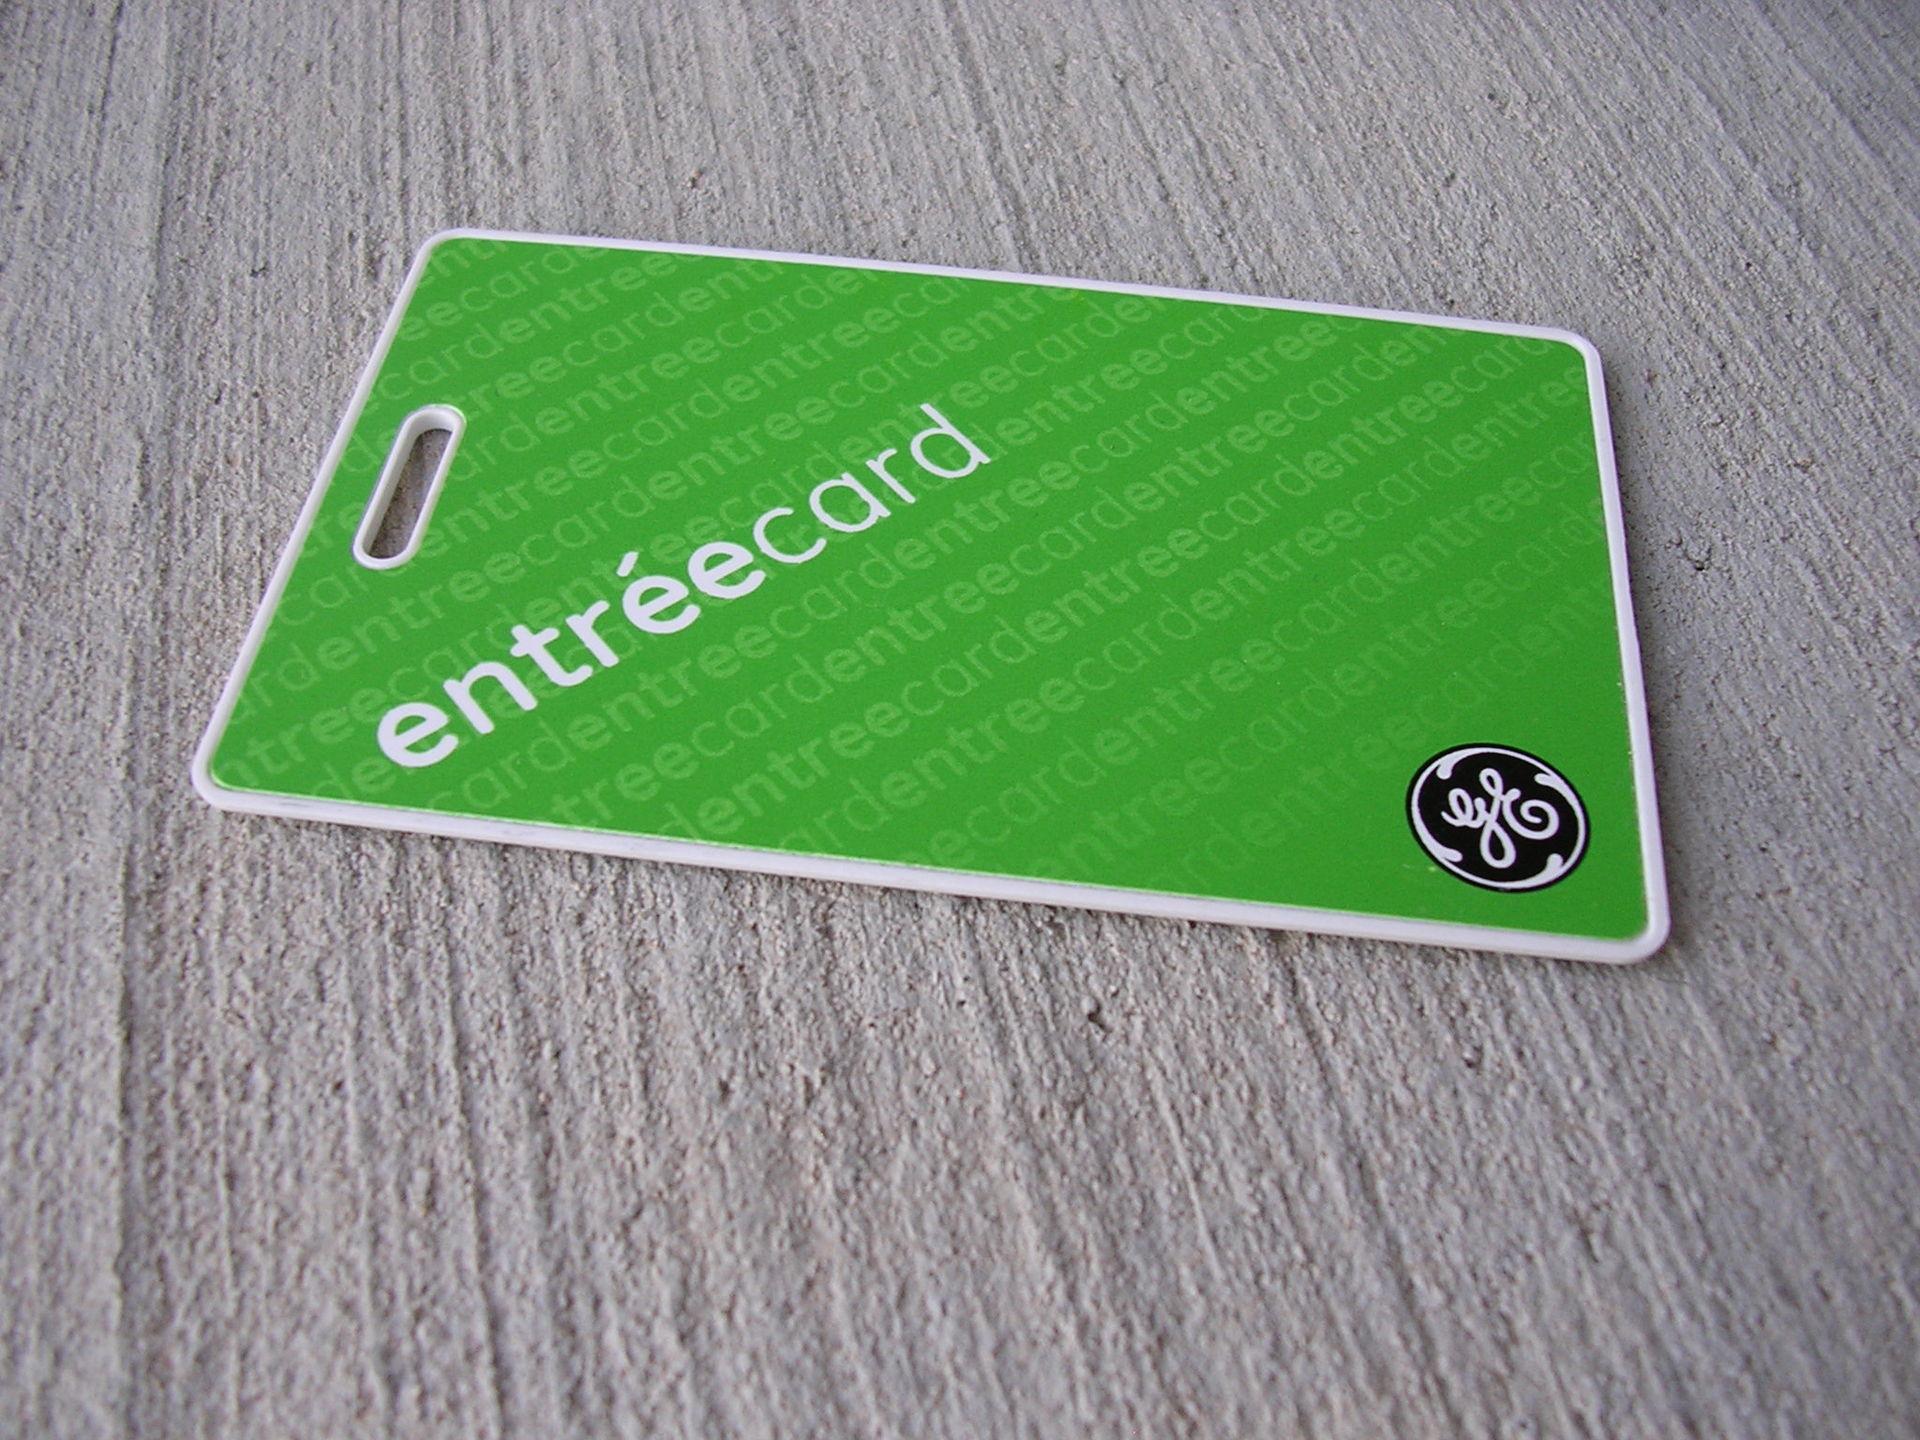 Badge Access Door : Proximity card wikipedia